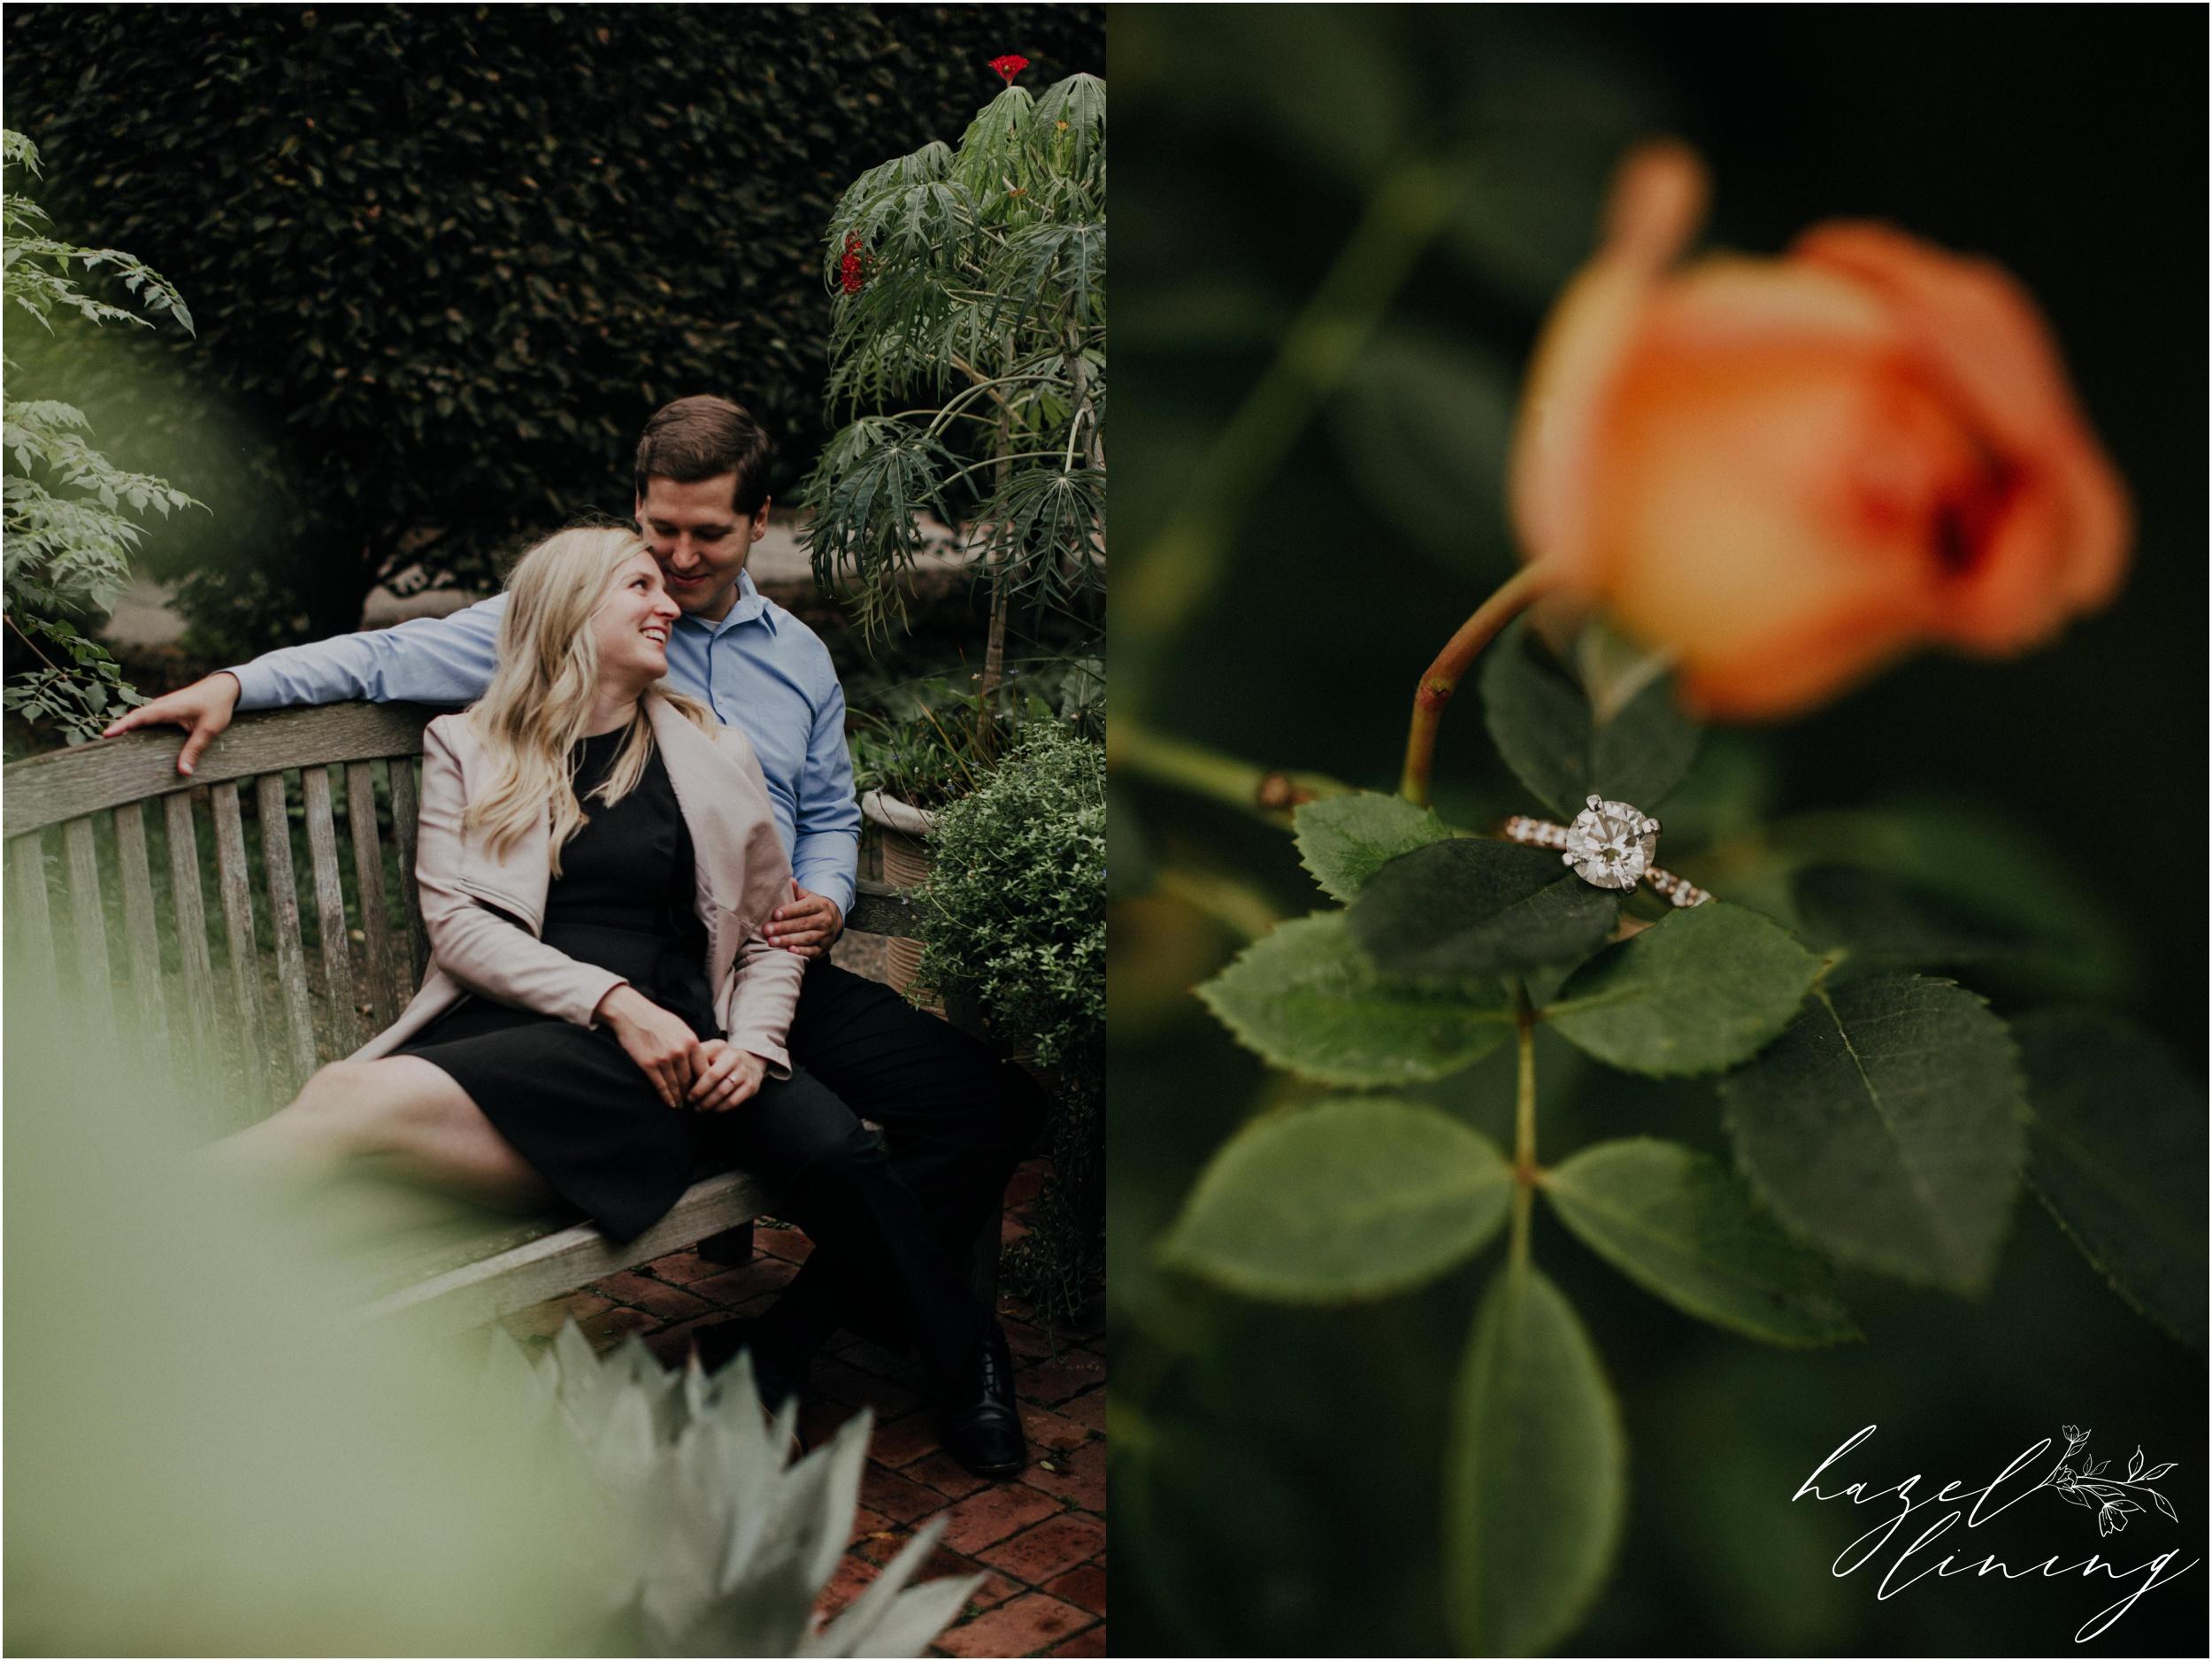 victoria-travis-logan-mayes-longwood-gardens-kennett-square-philadelphia-engagement-session-hazel-lining-photography-destination-elopement-wedding-engagement-photography_0033.jpg